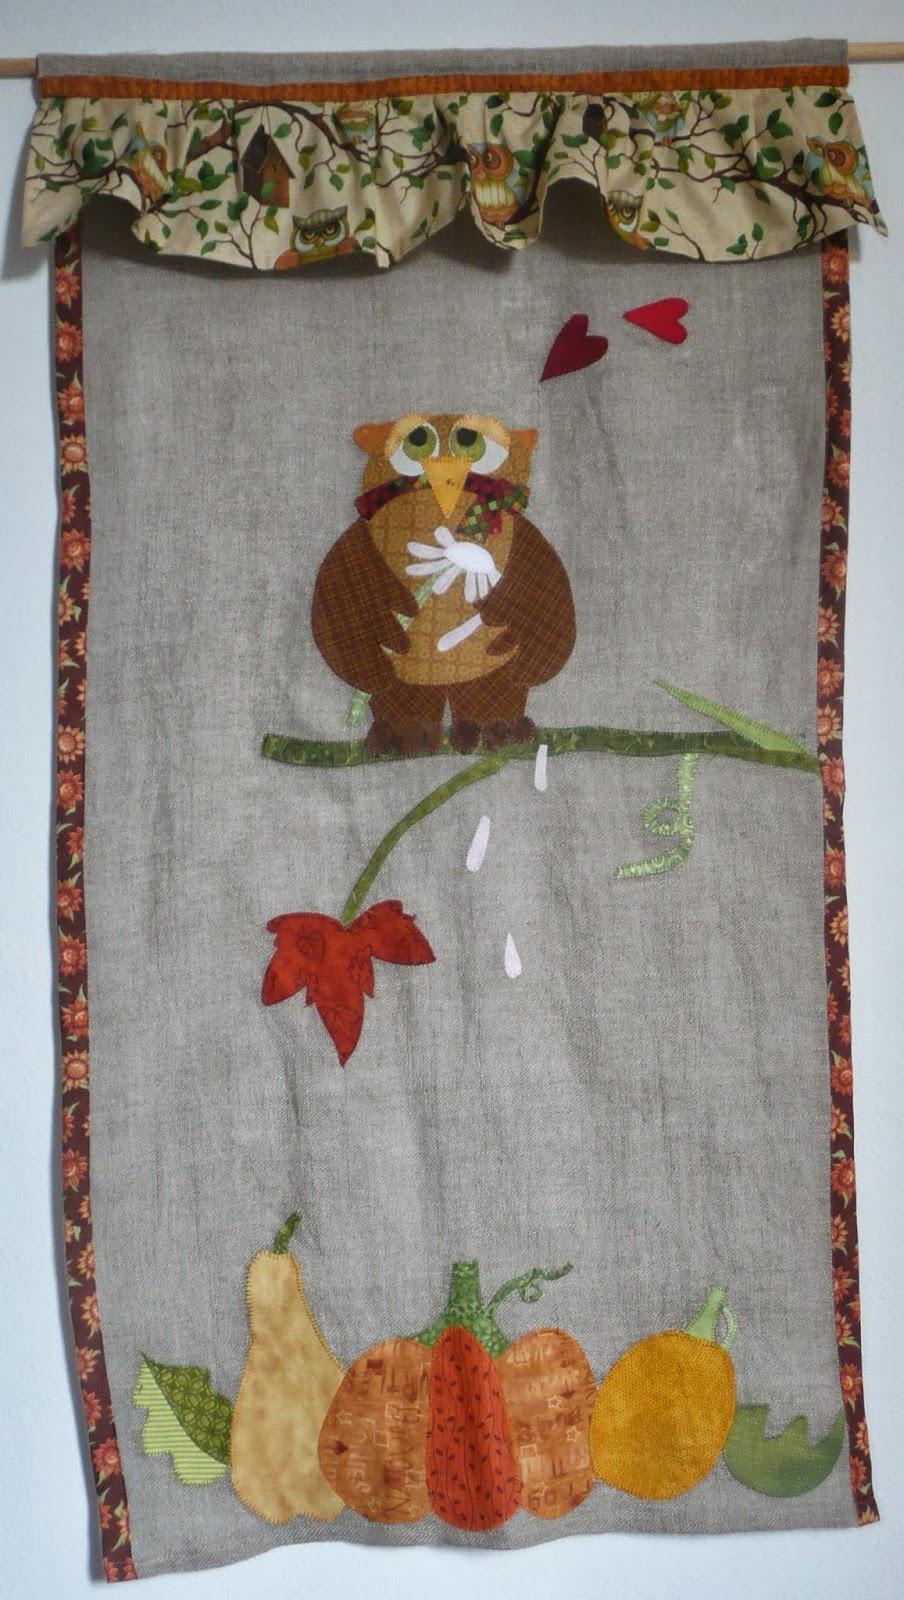 Il patchwork veste casa tende patchwork for Applique cameretta bimbi